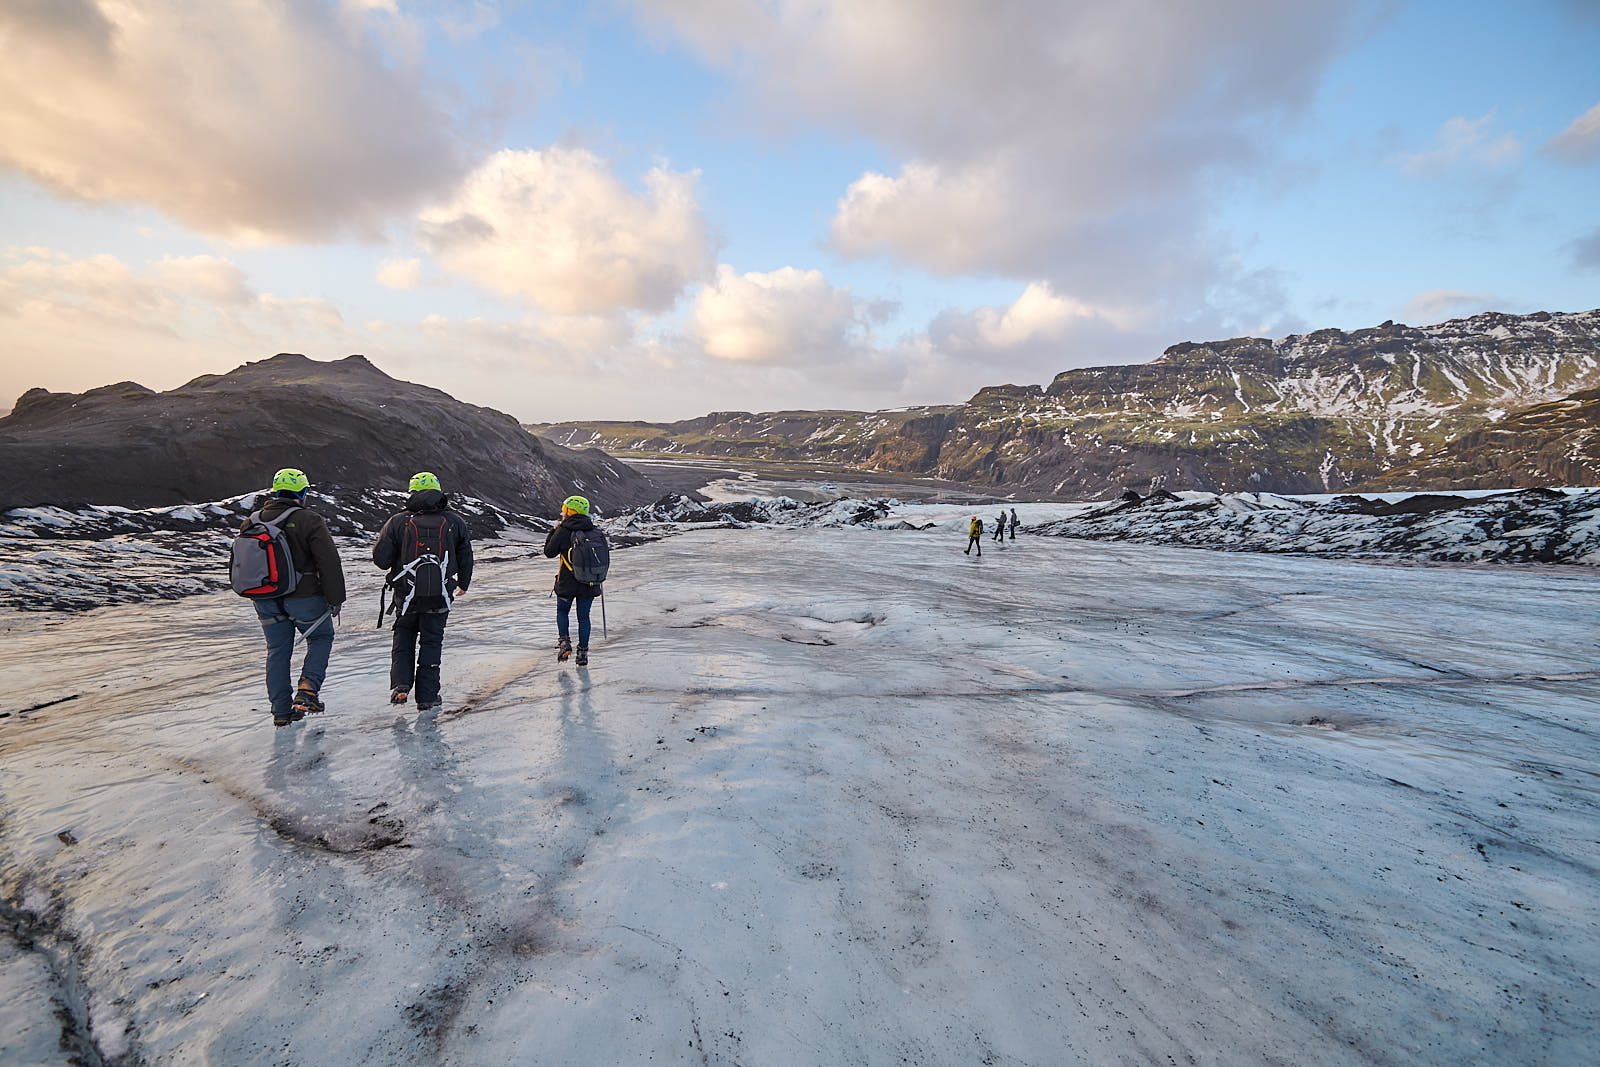 Team Iceland taking on a glacier. Photo by Bruce Lomasky.